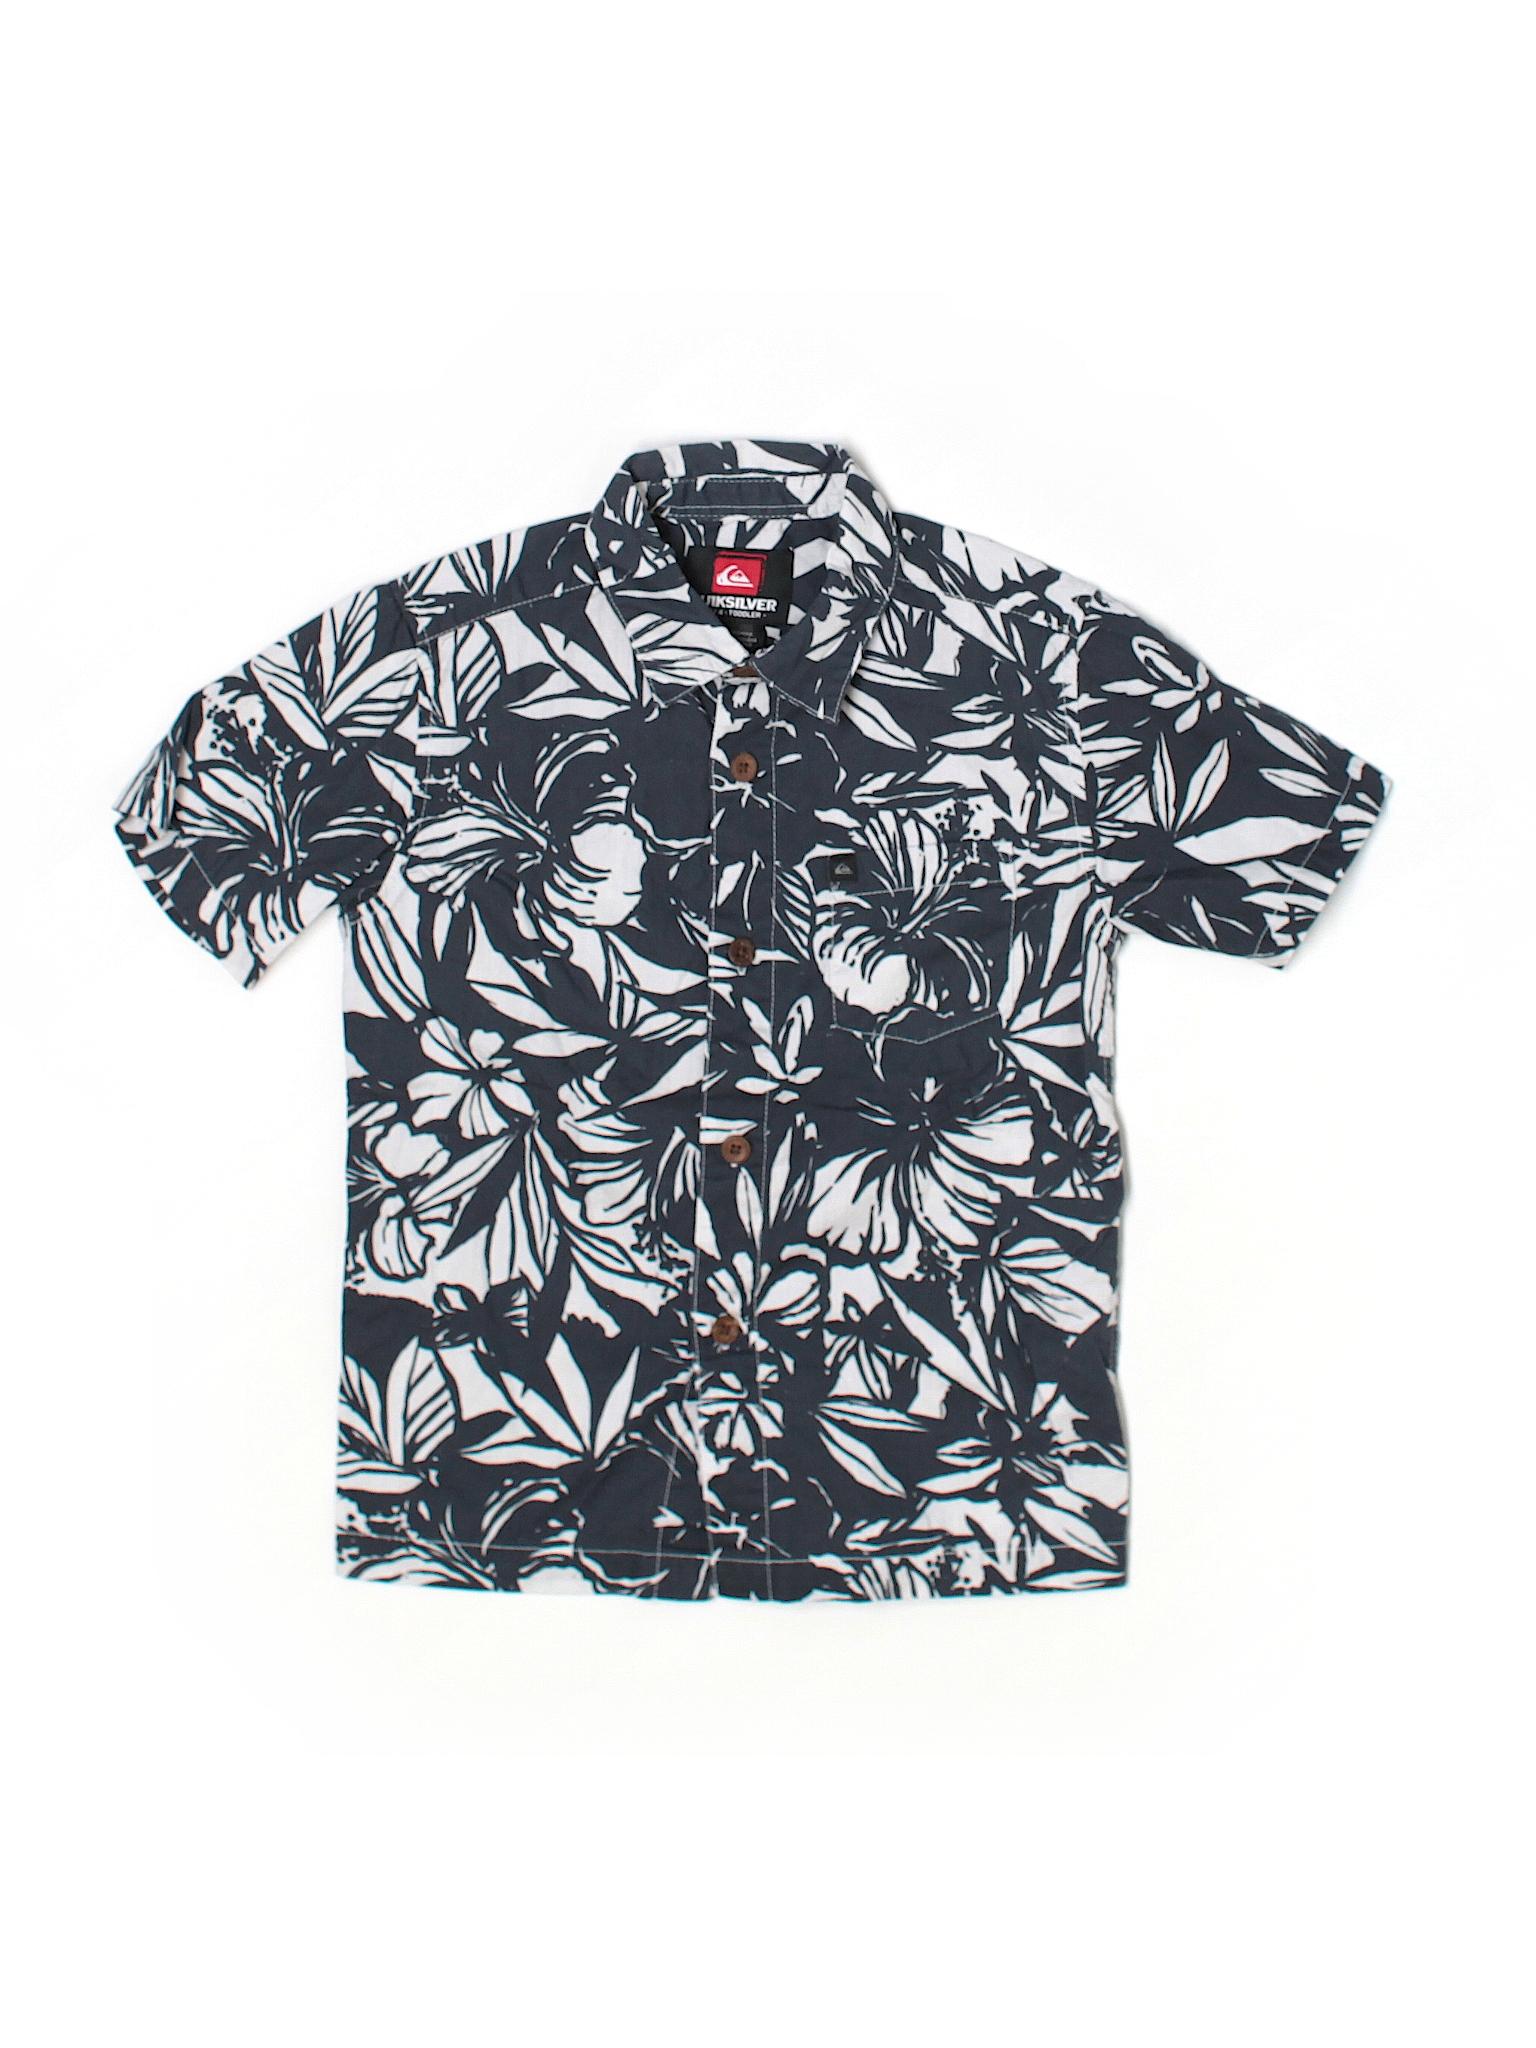 Quiksilver short sleeve button down shirt 65 off only for Bureau quiksilver